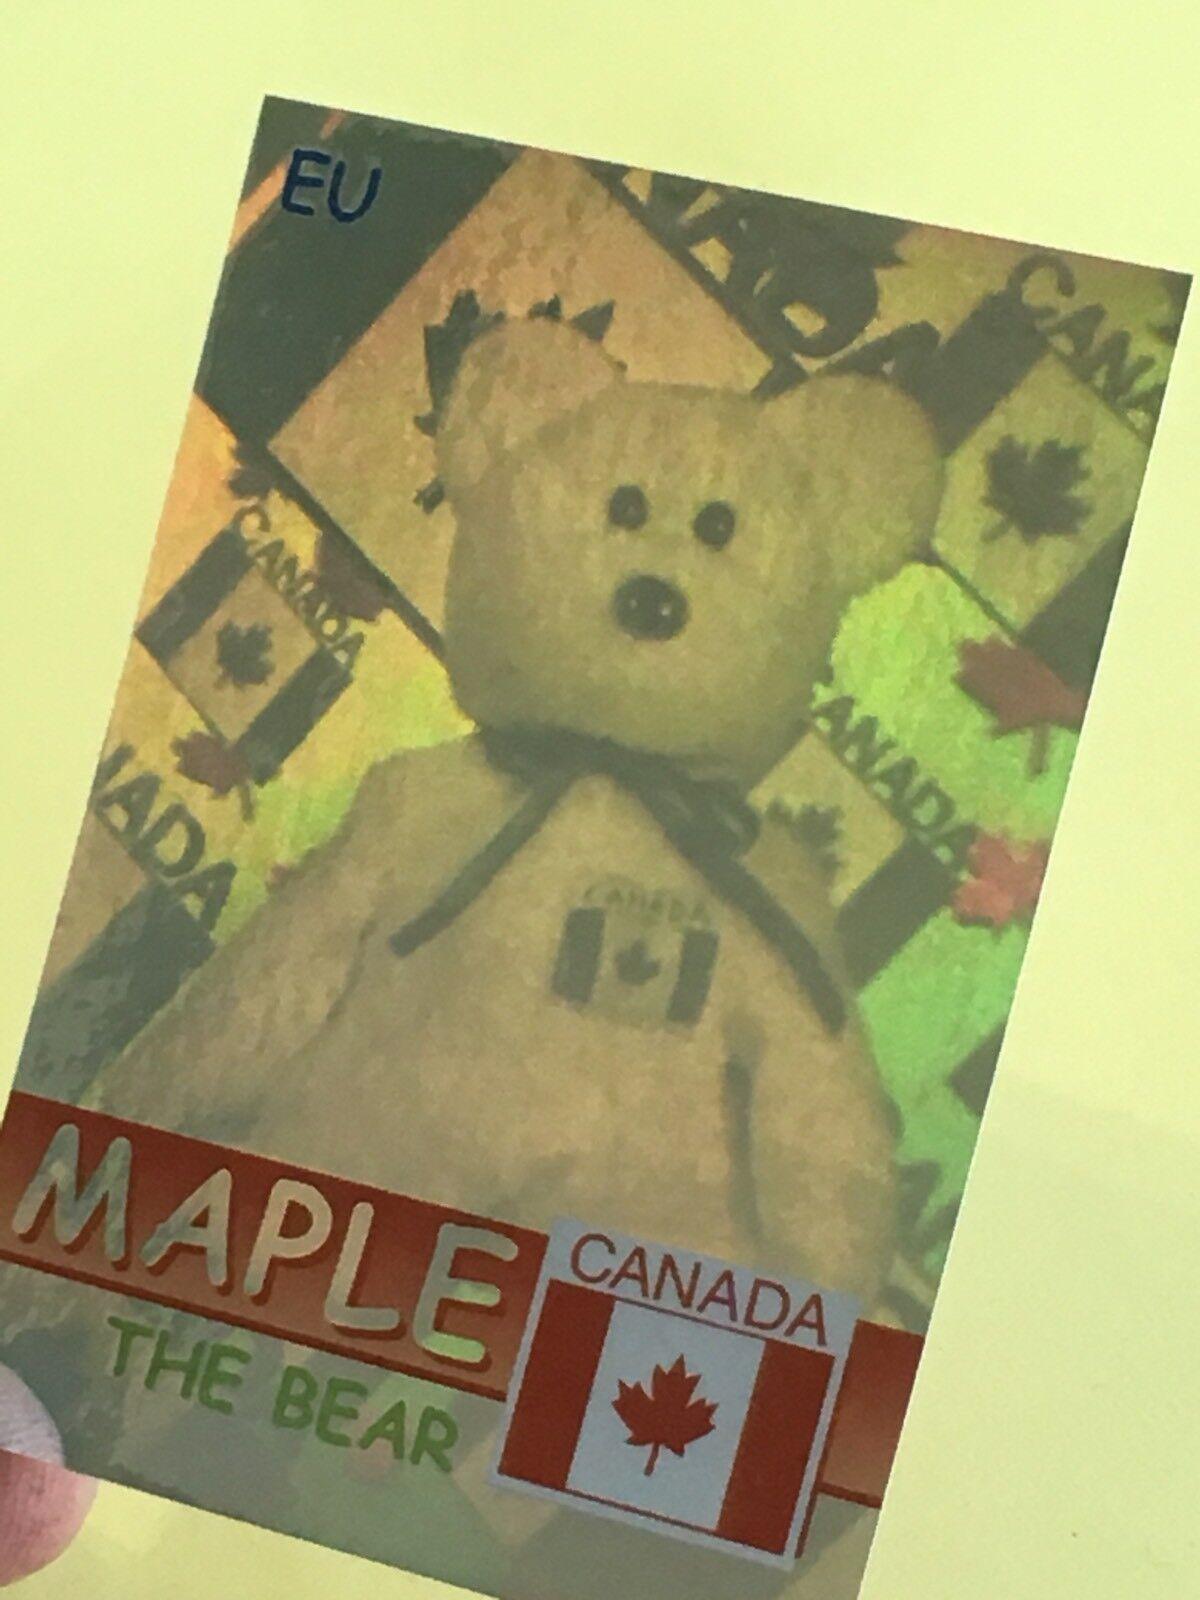 Ty Beanie Babies Trading Card EU Maple The Bear Hologram, Series 2 (426 540)